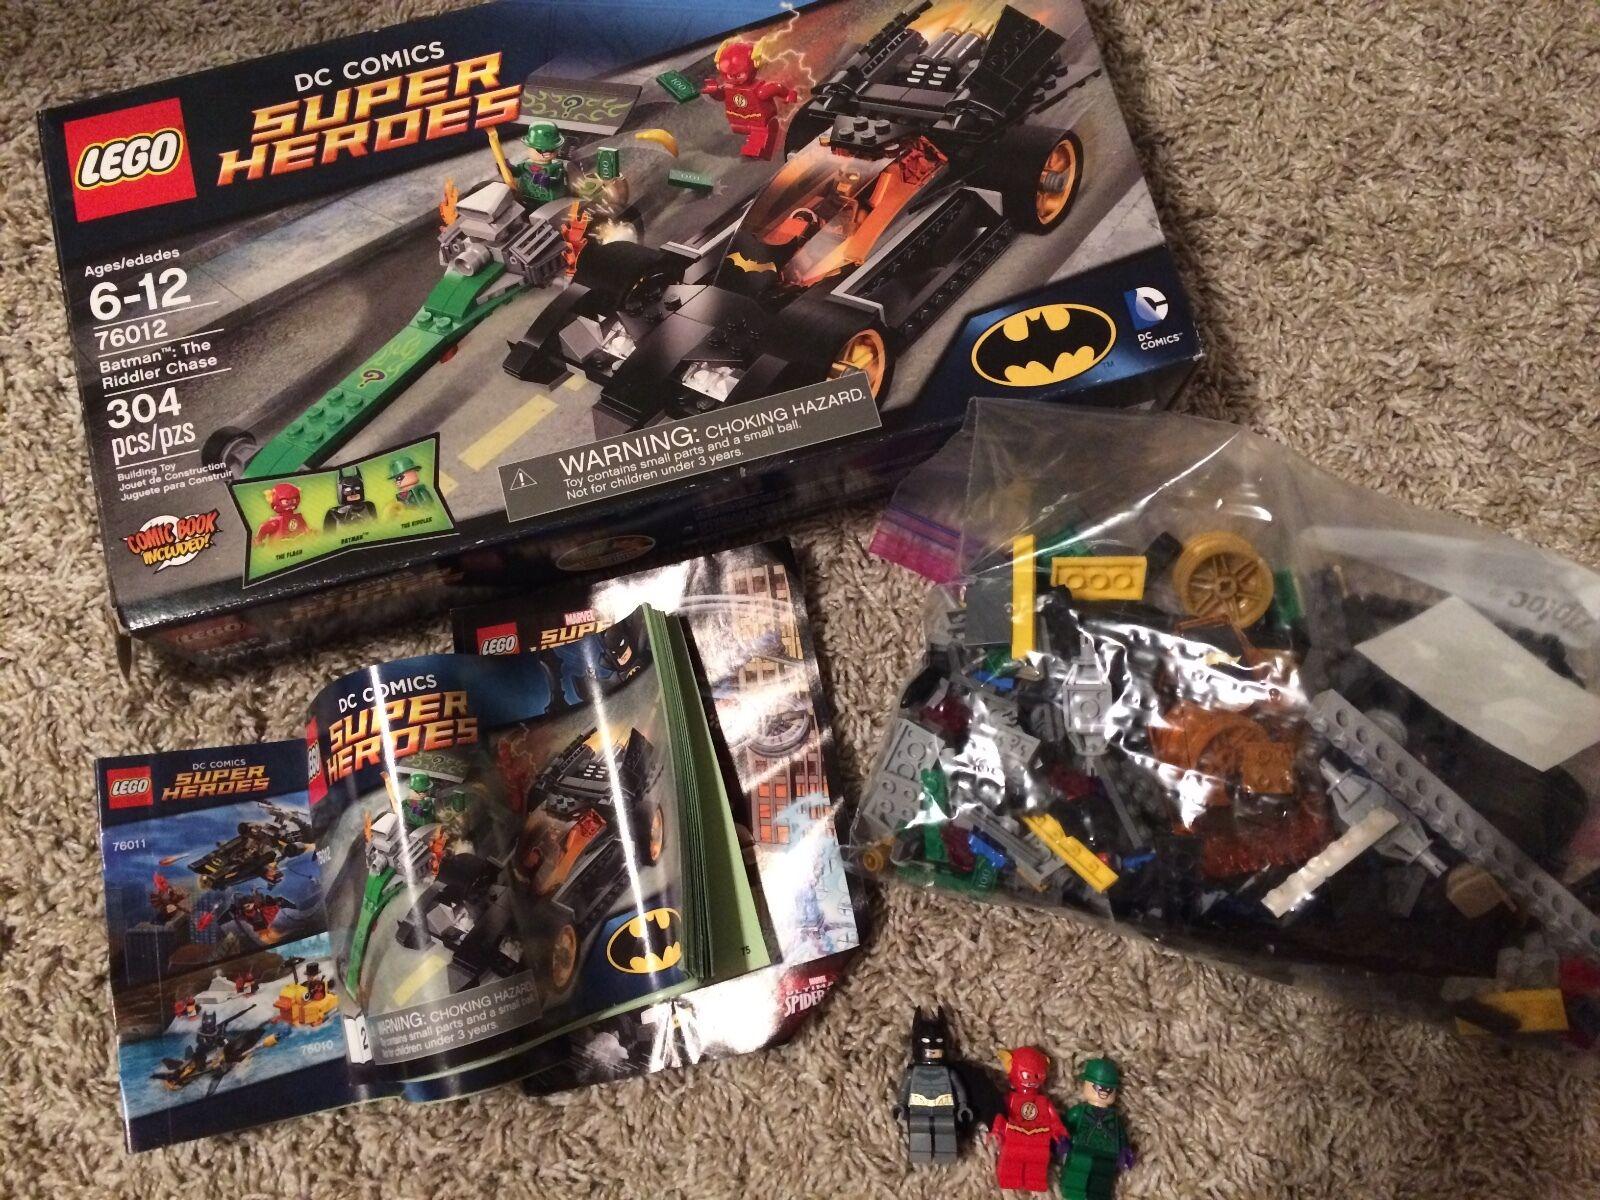 Lego kit 76012 Batman  The Riddler Chase Chase Chase - DC Comics Superheros cddf78